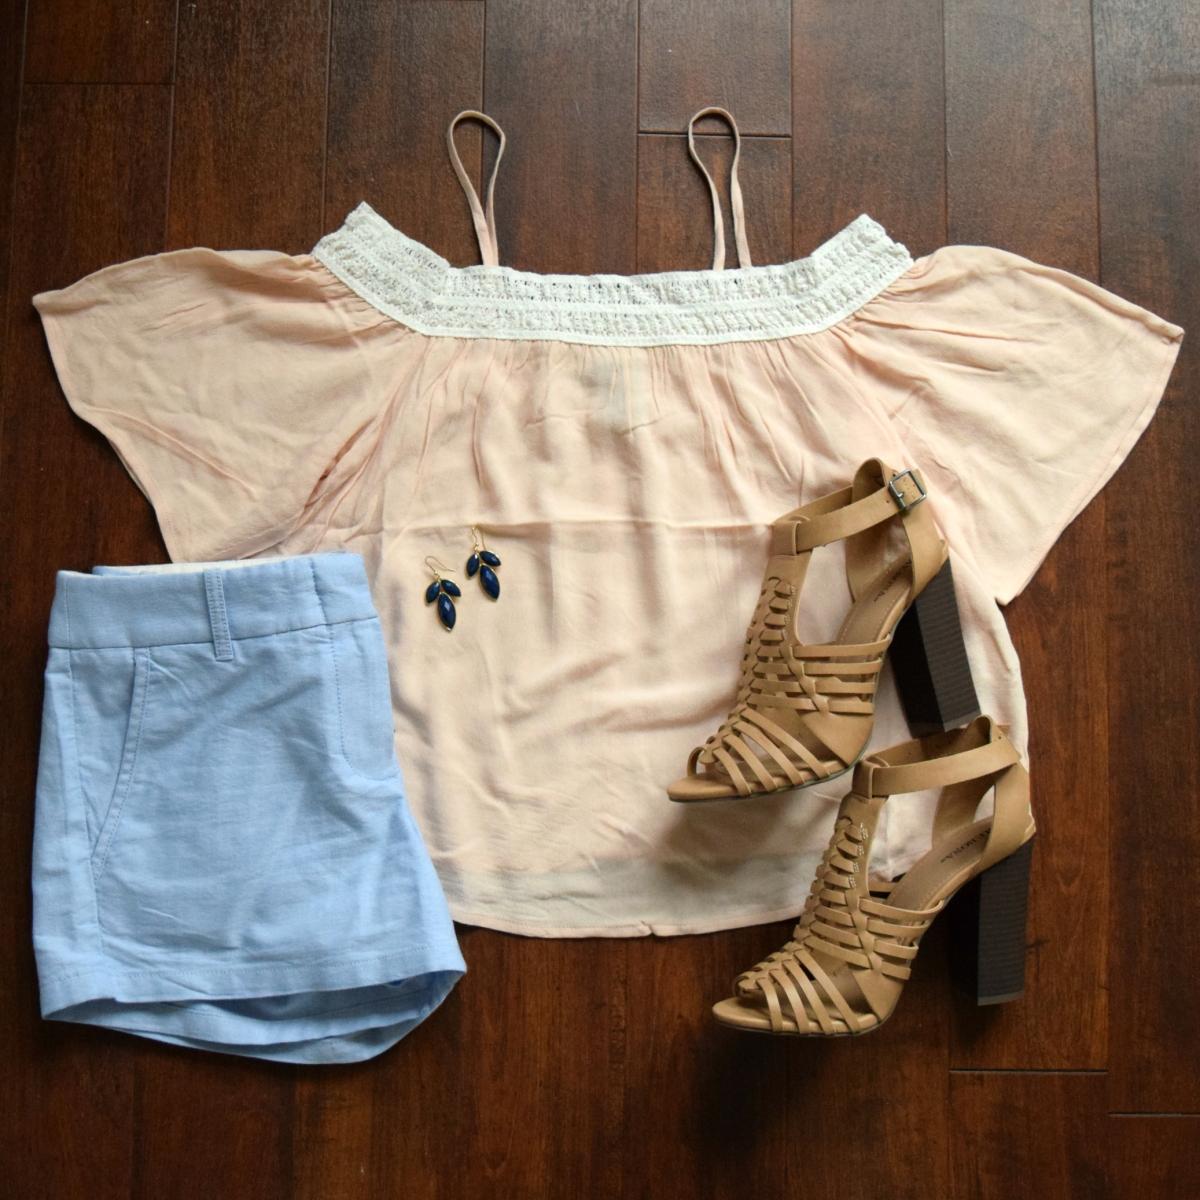 pink off the shoulder and blue linen shorts |www.pearlsandsportsbras.com|